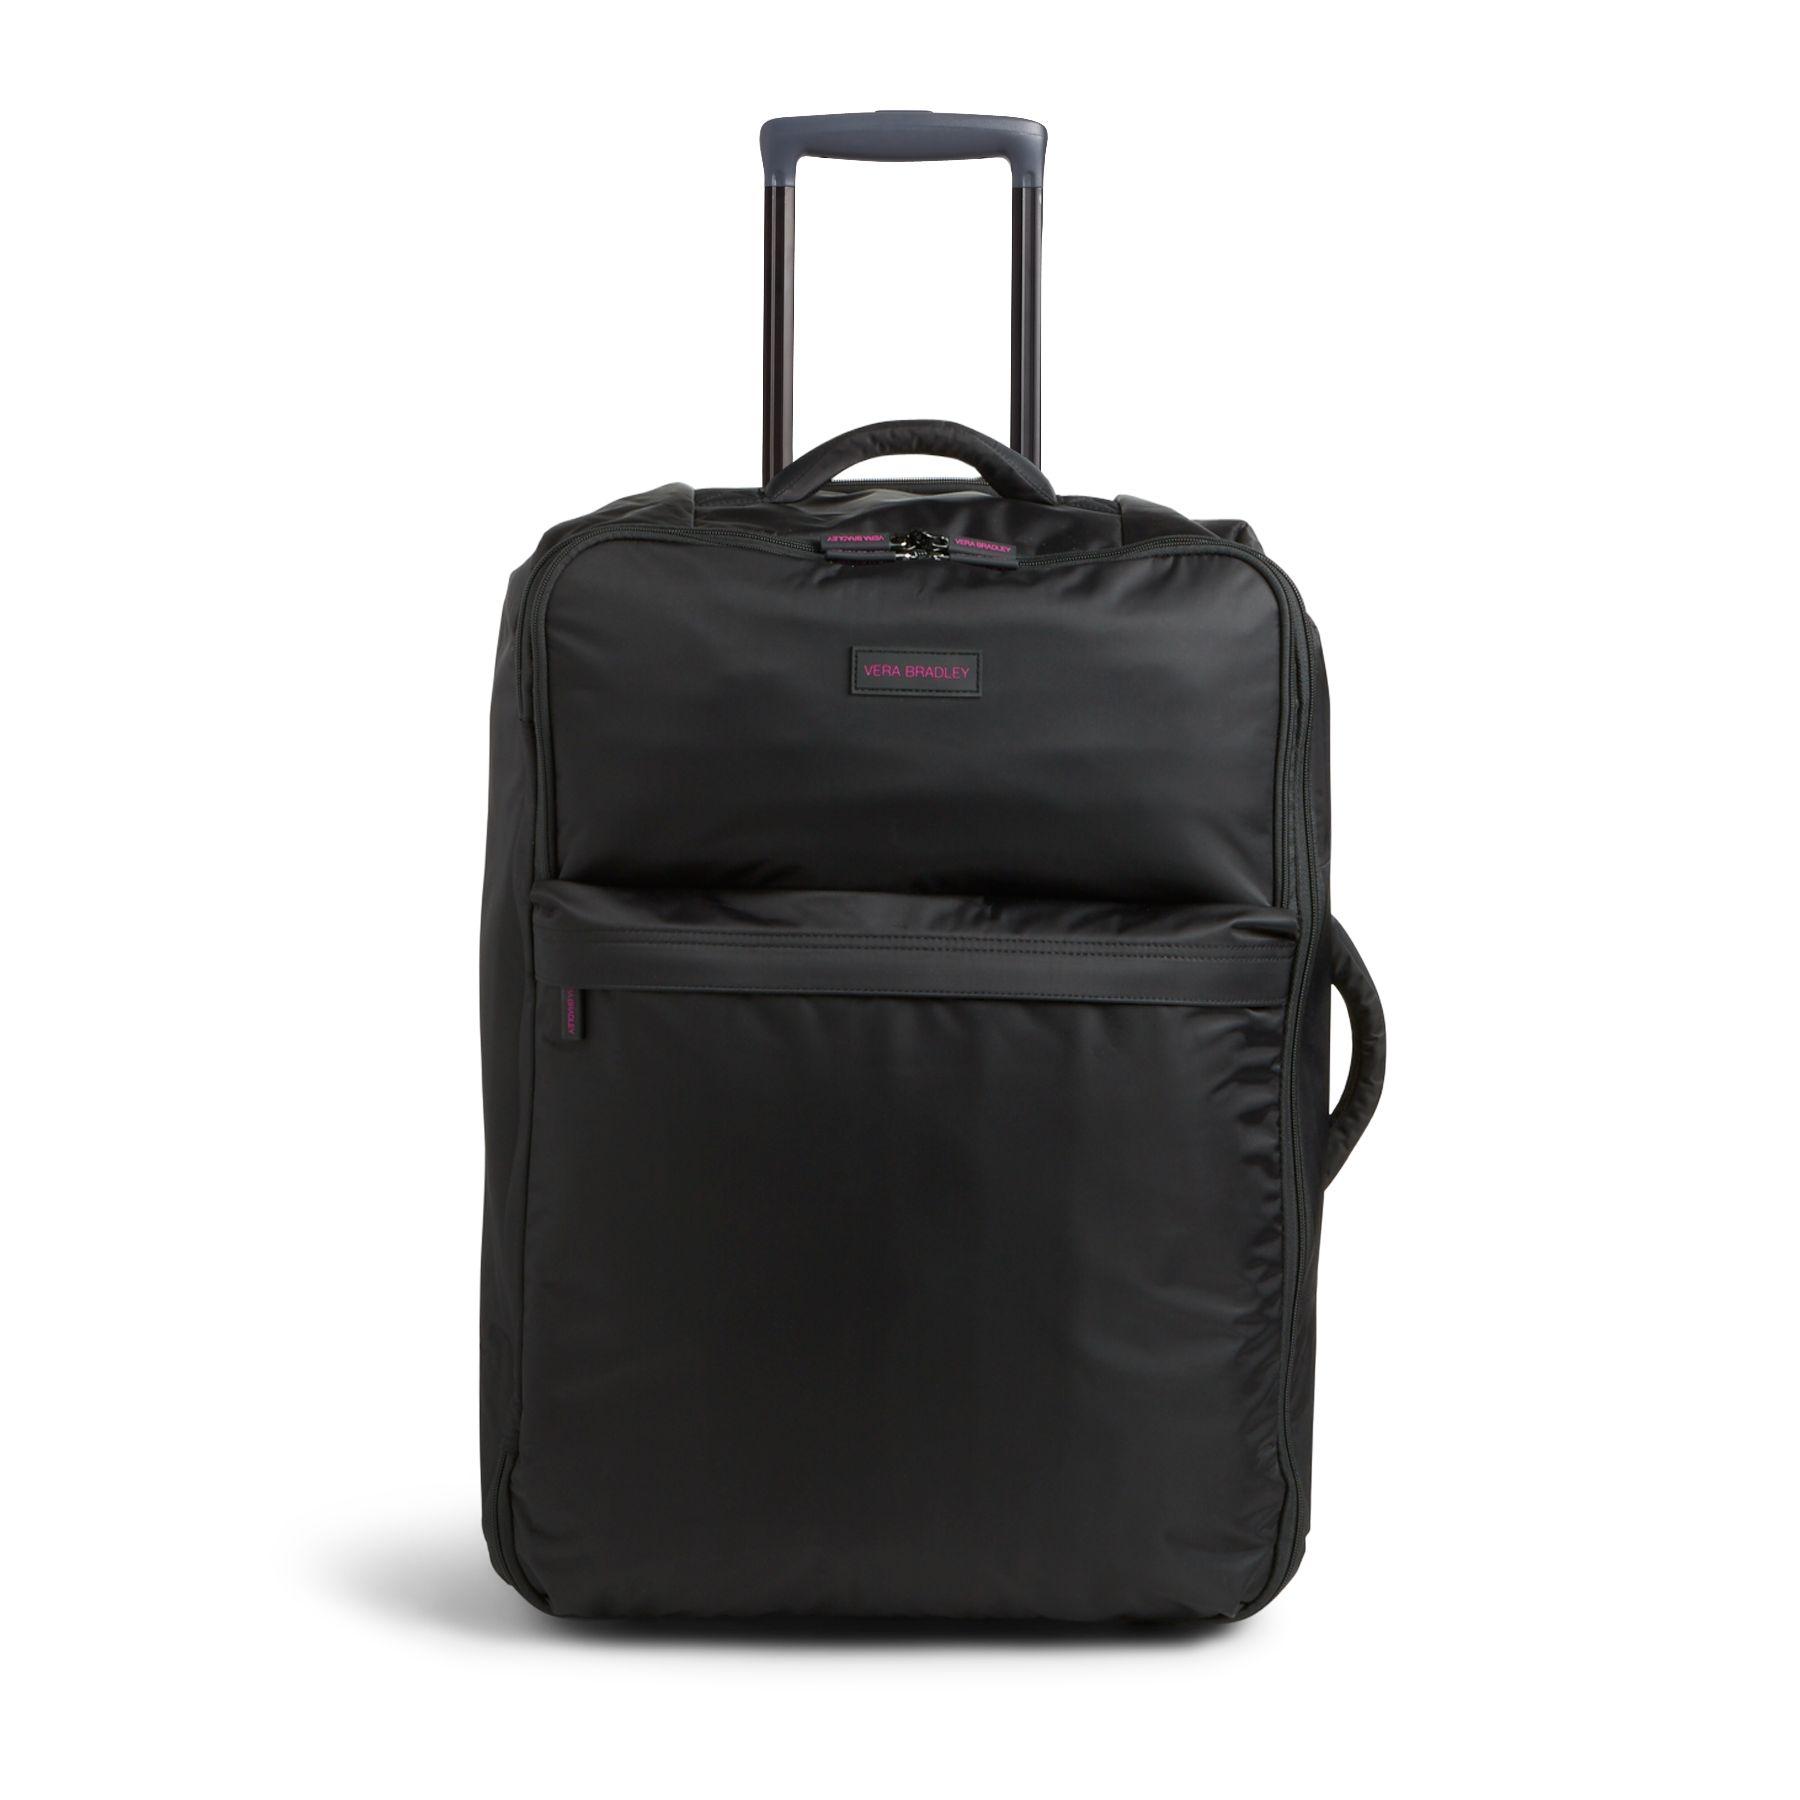 Vera Bradley Large Foldable Roller Luggage in Black